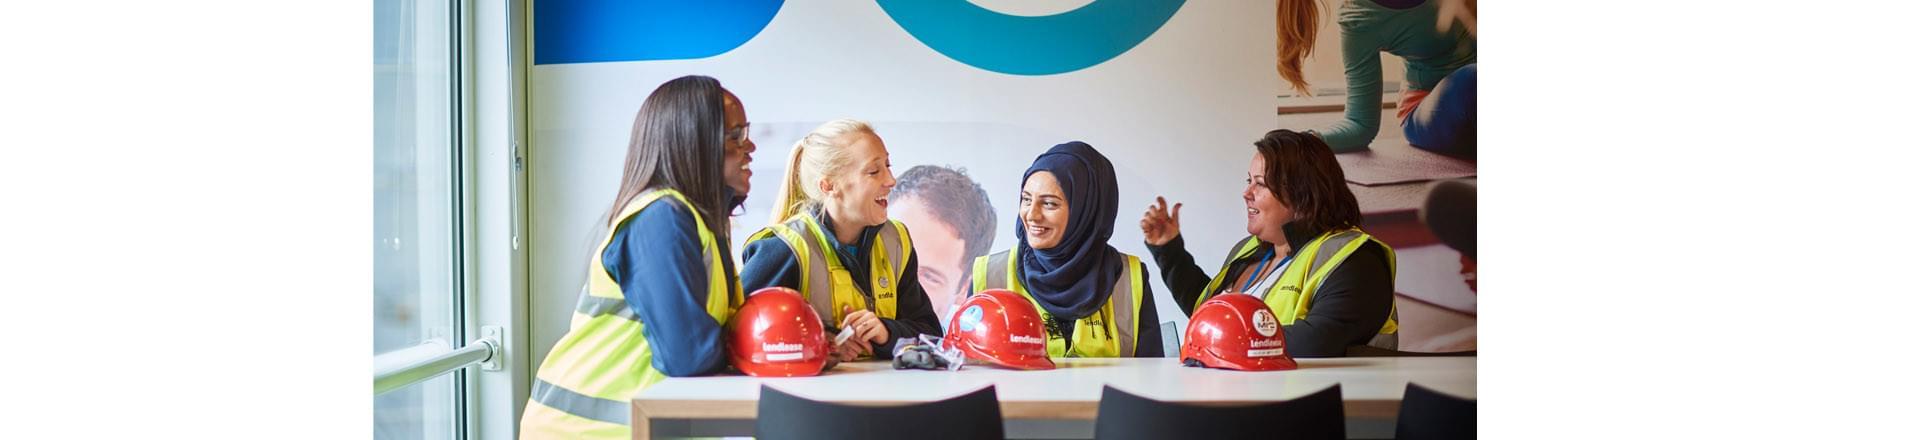 image of female engineers